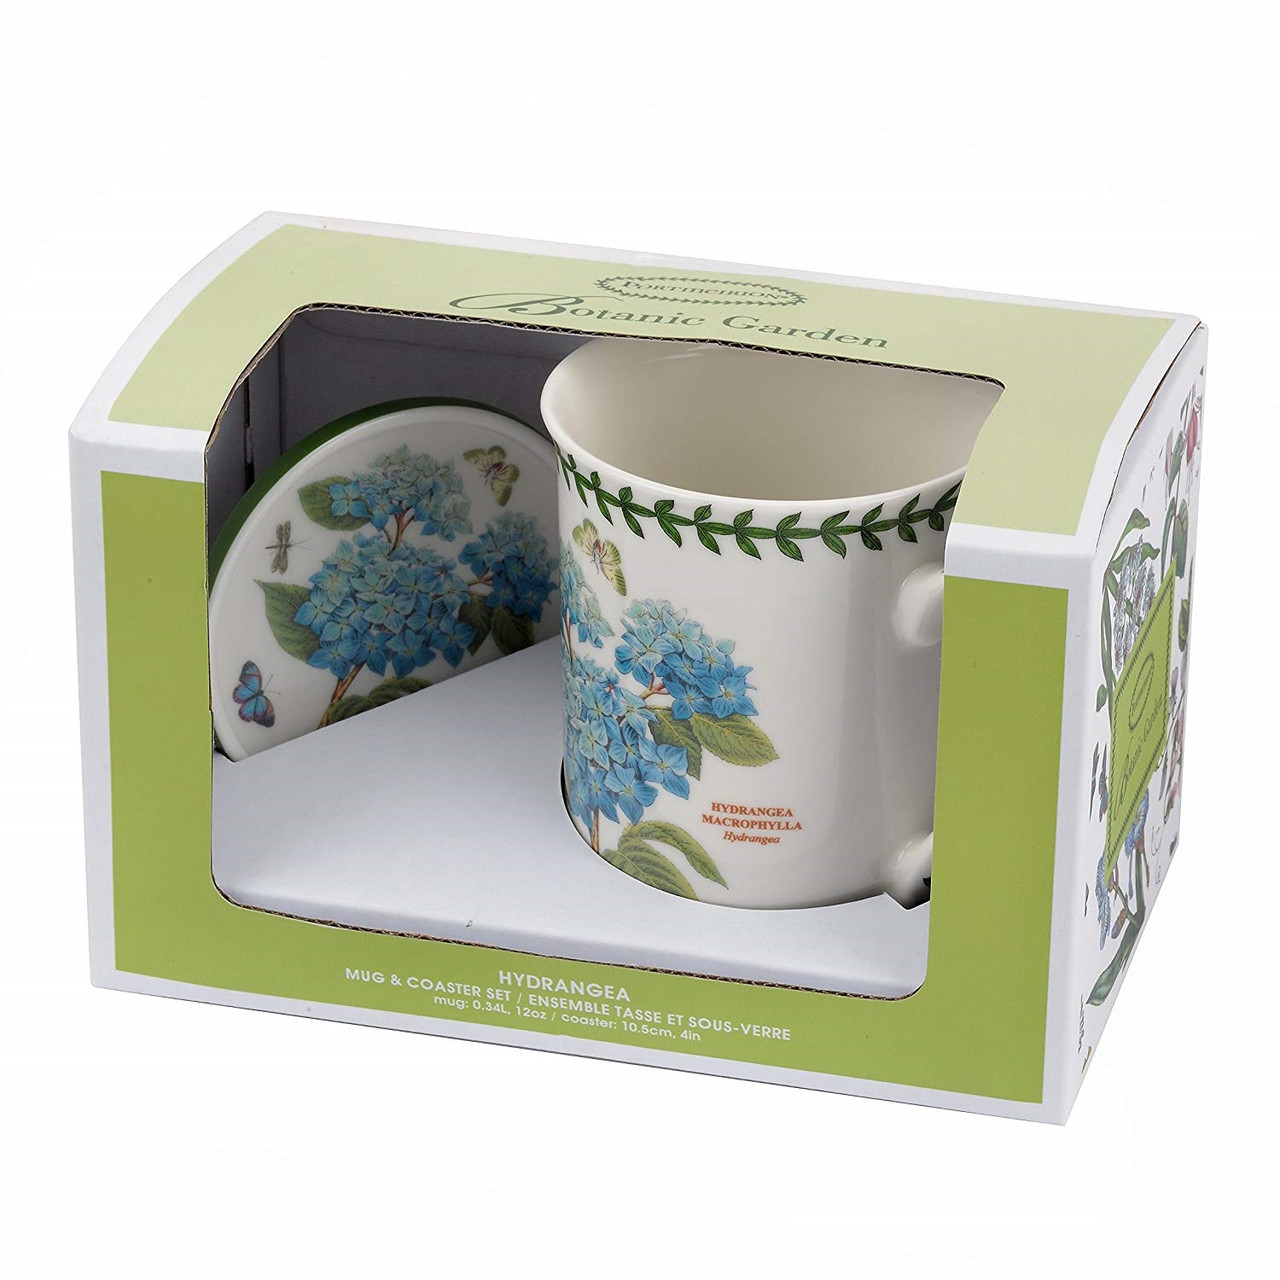 Ceramic Floral Coffee Mug Coaster Hydrangea Set Botanic Garden